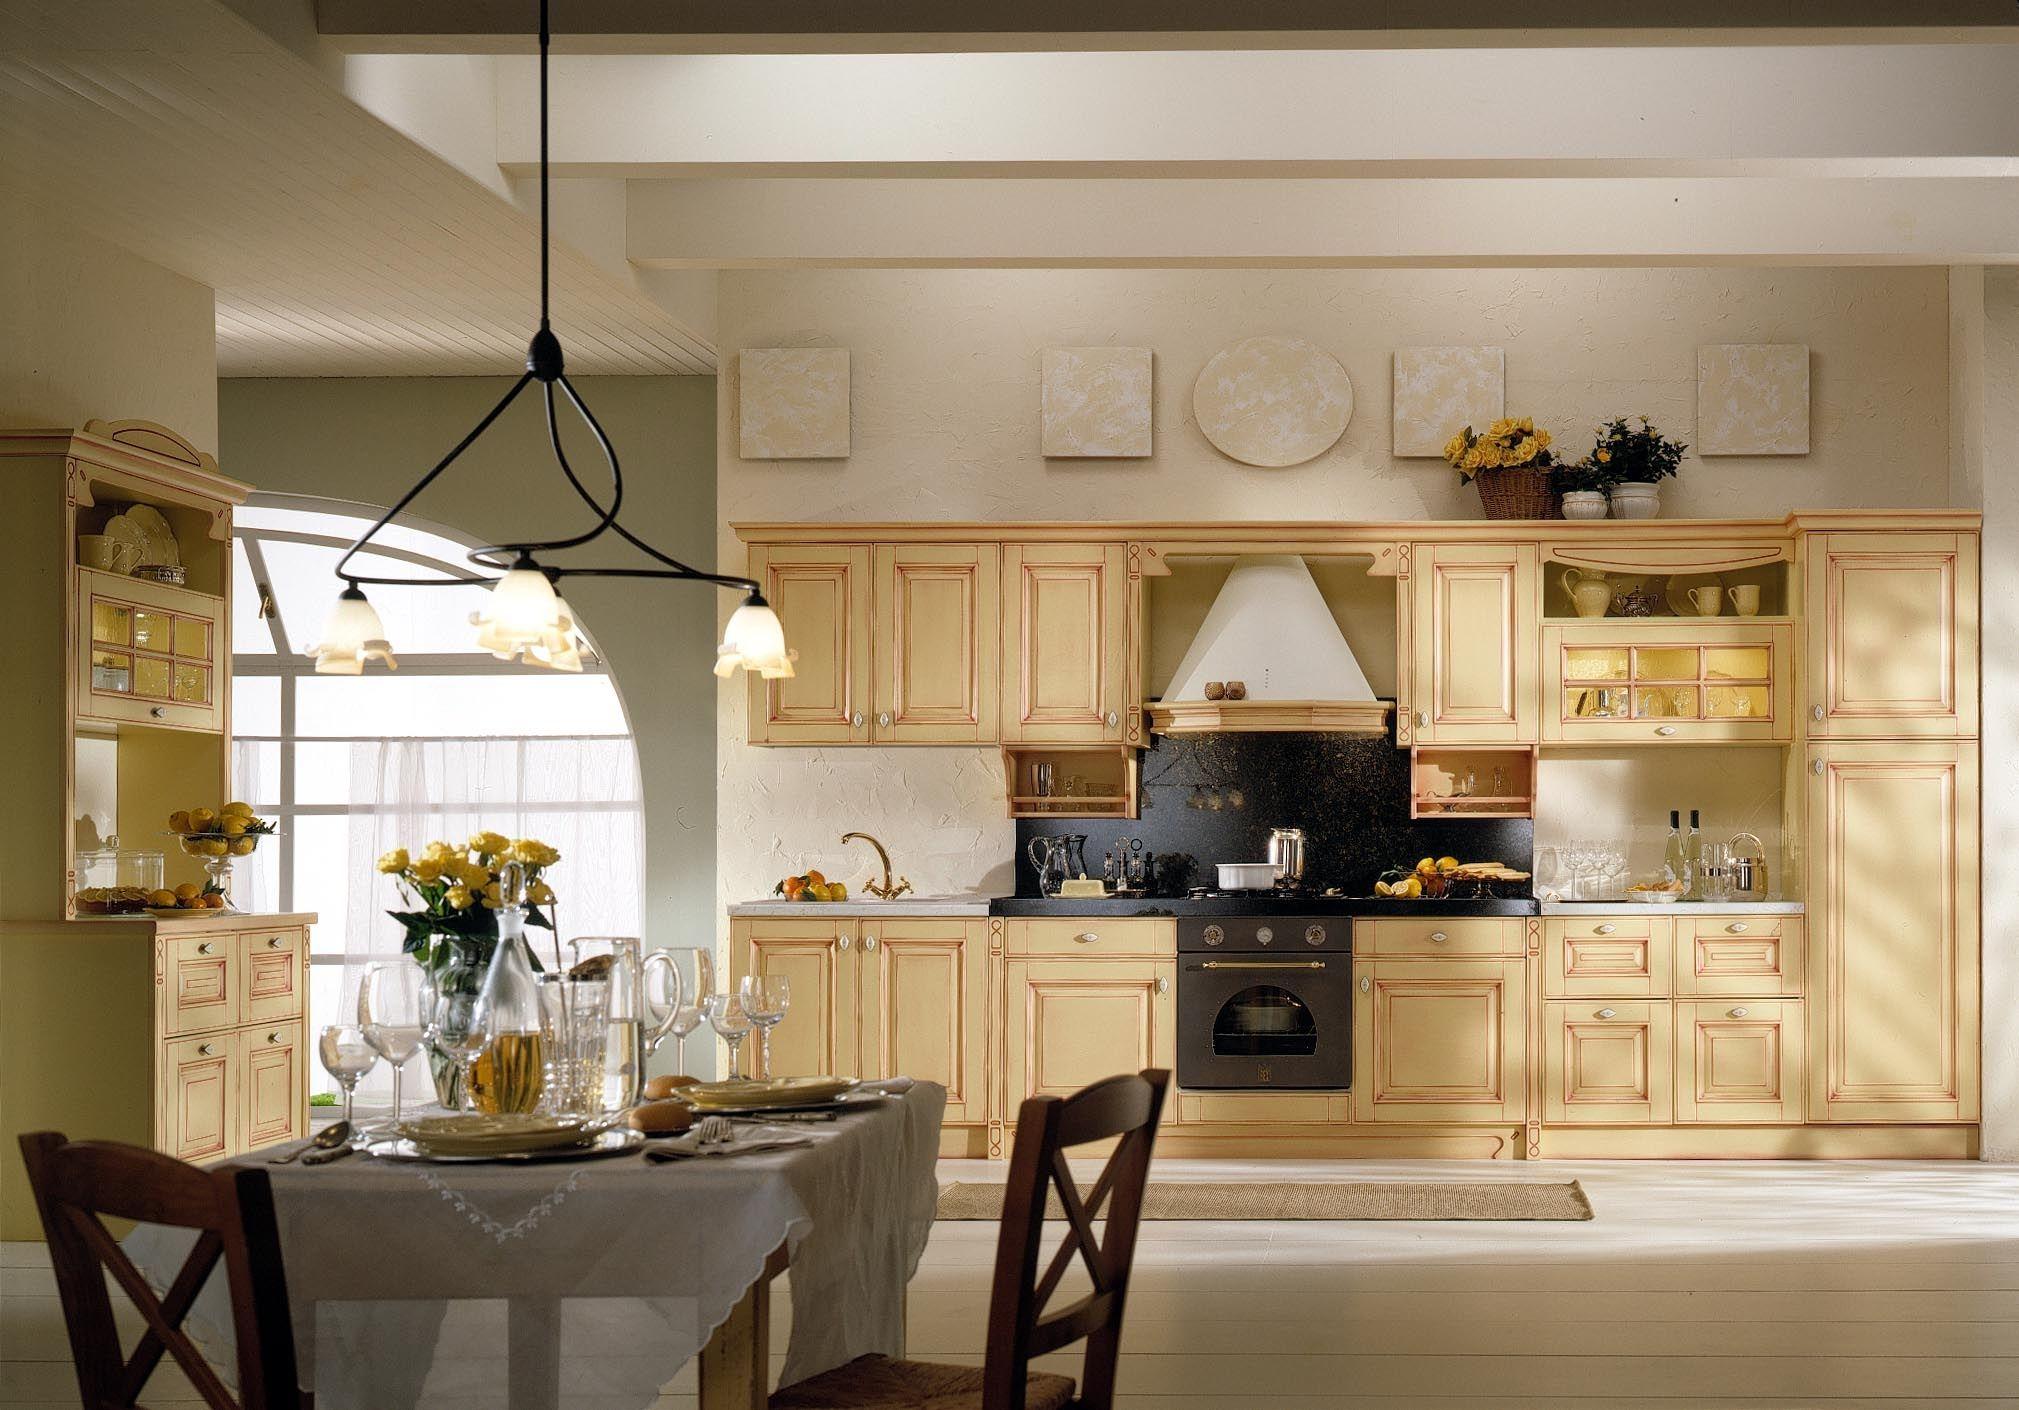 Cucine classiche provenzale gemal cucine pinterest for Cucine pinterest